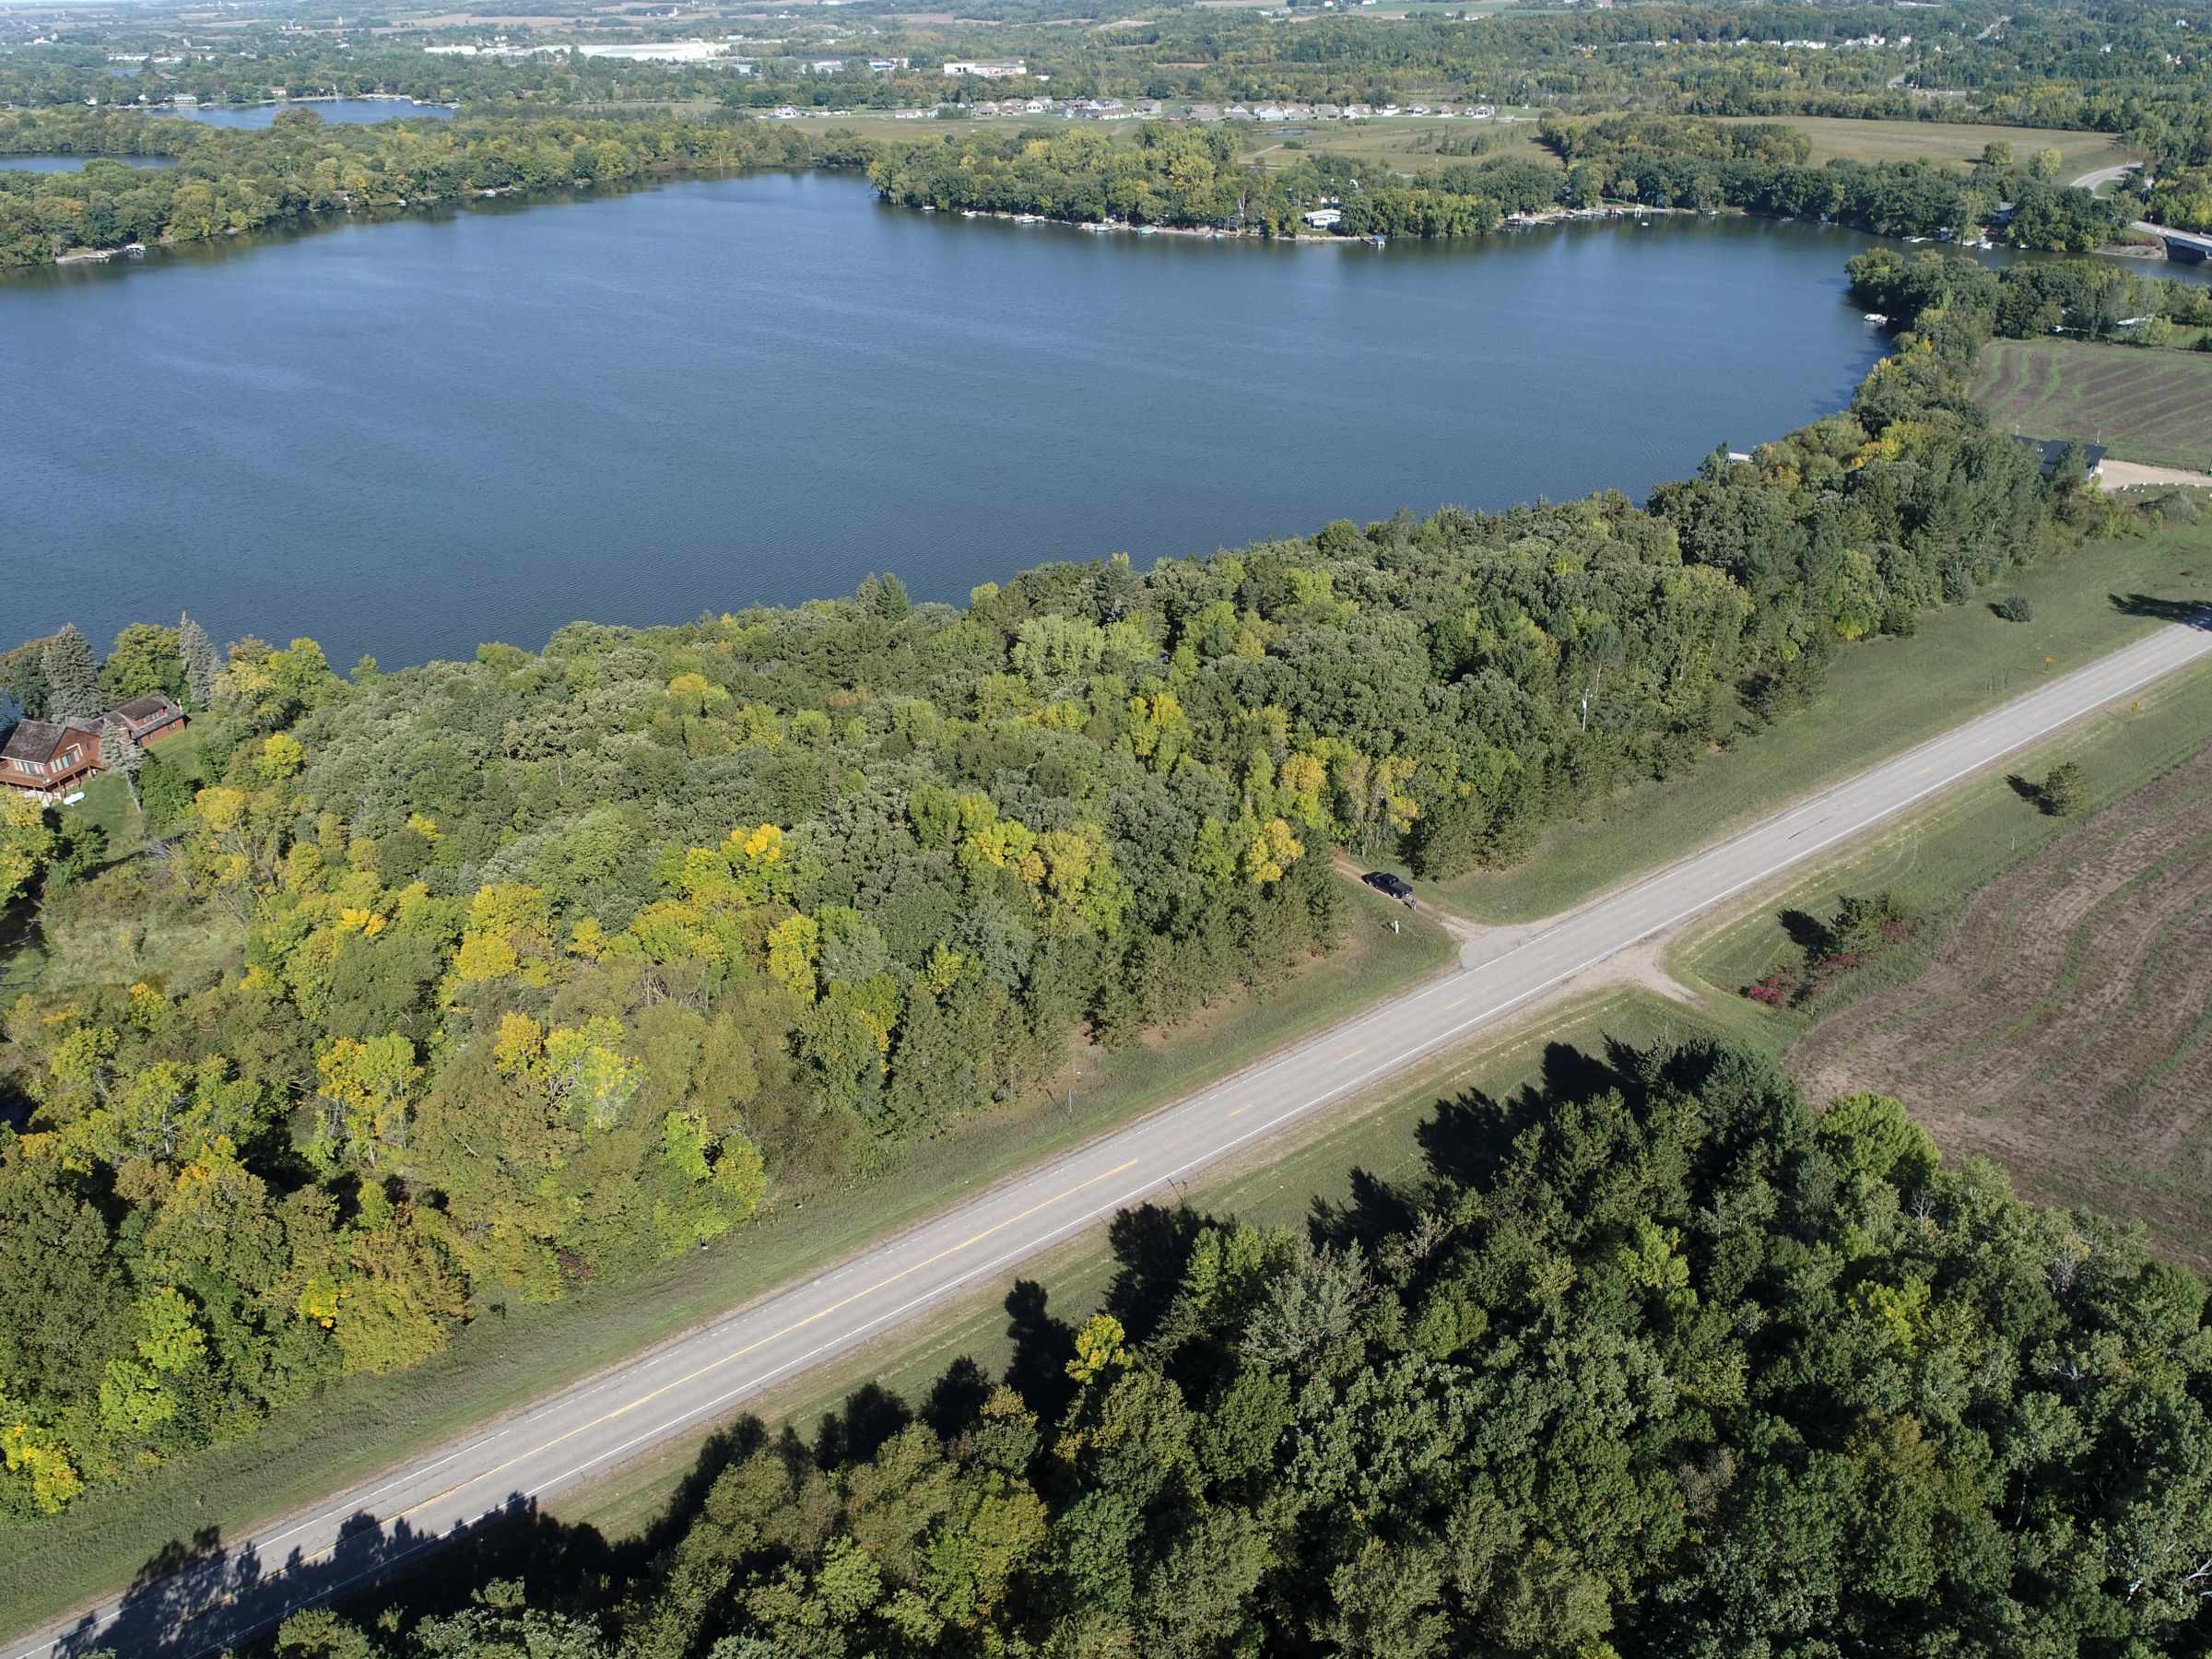 land-stearns-county-minnesota-298-acres-listing-number-15712-0-2021-09-23-131311.JPG